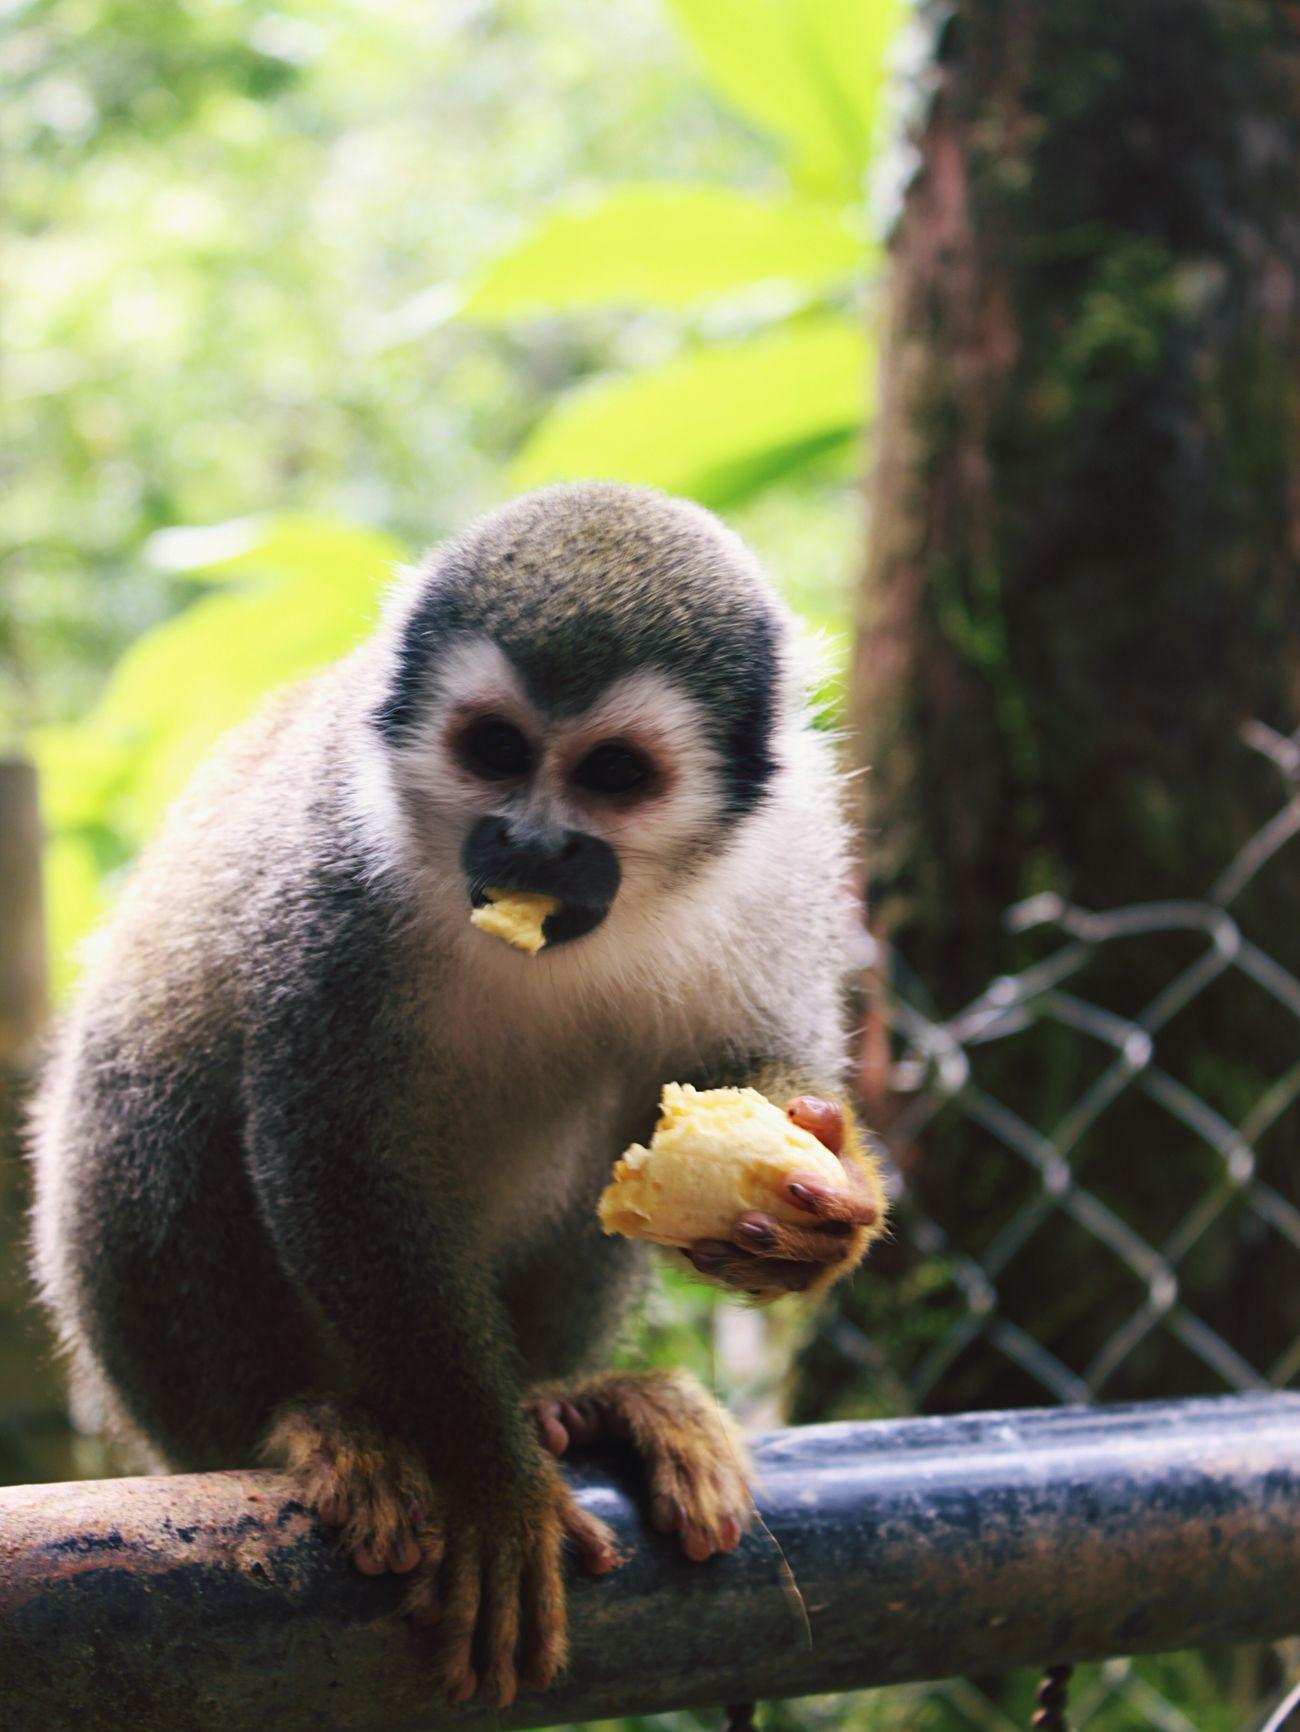 Eating Banana Animals In The Wild One Animal Focus On Foreground Animal Wildlife Monkey Blackeyed Jungle Hungry